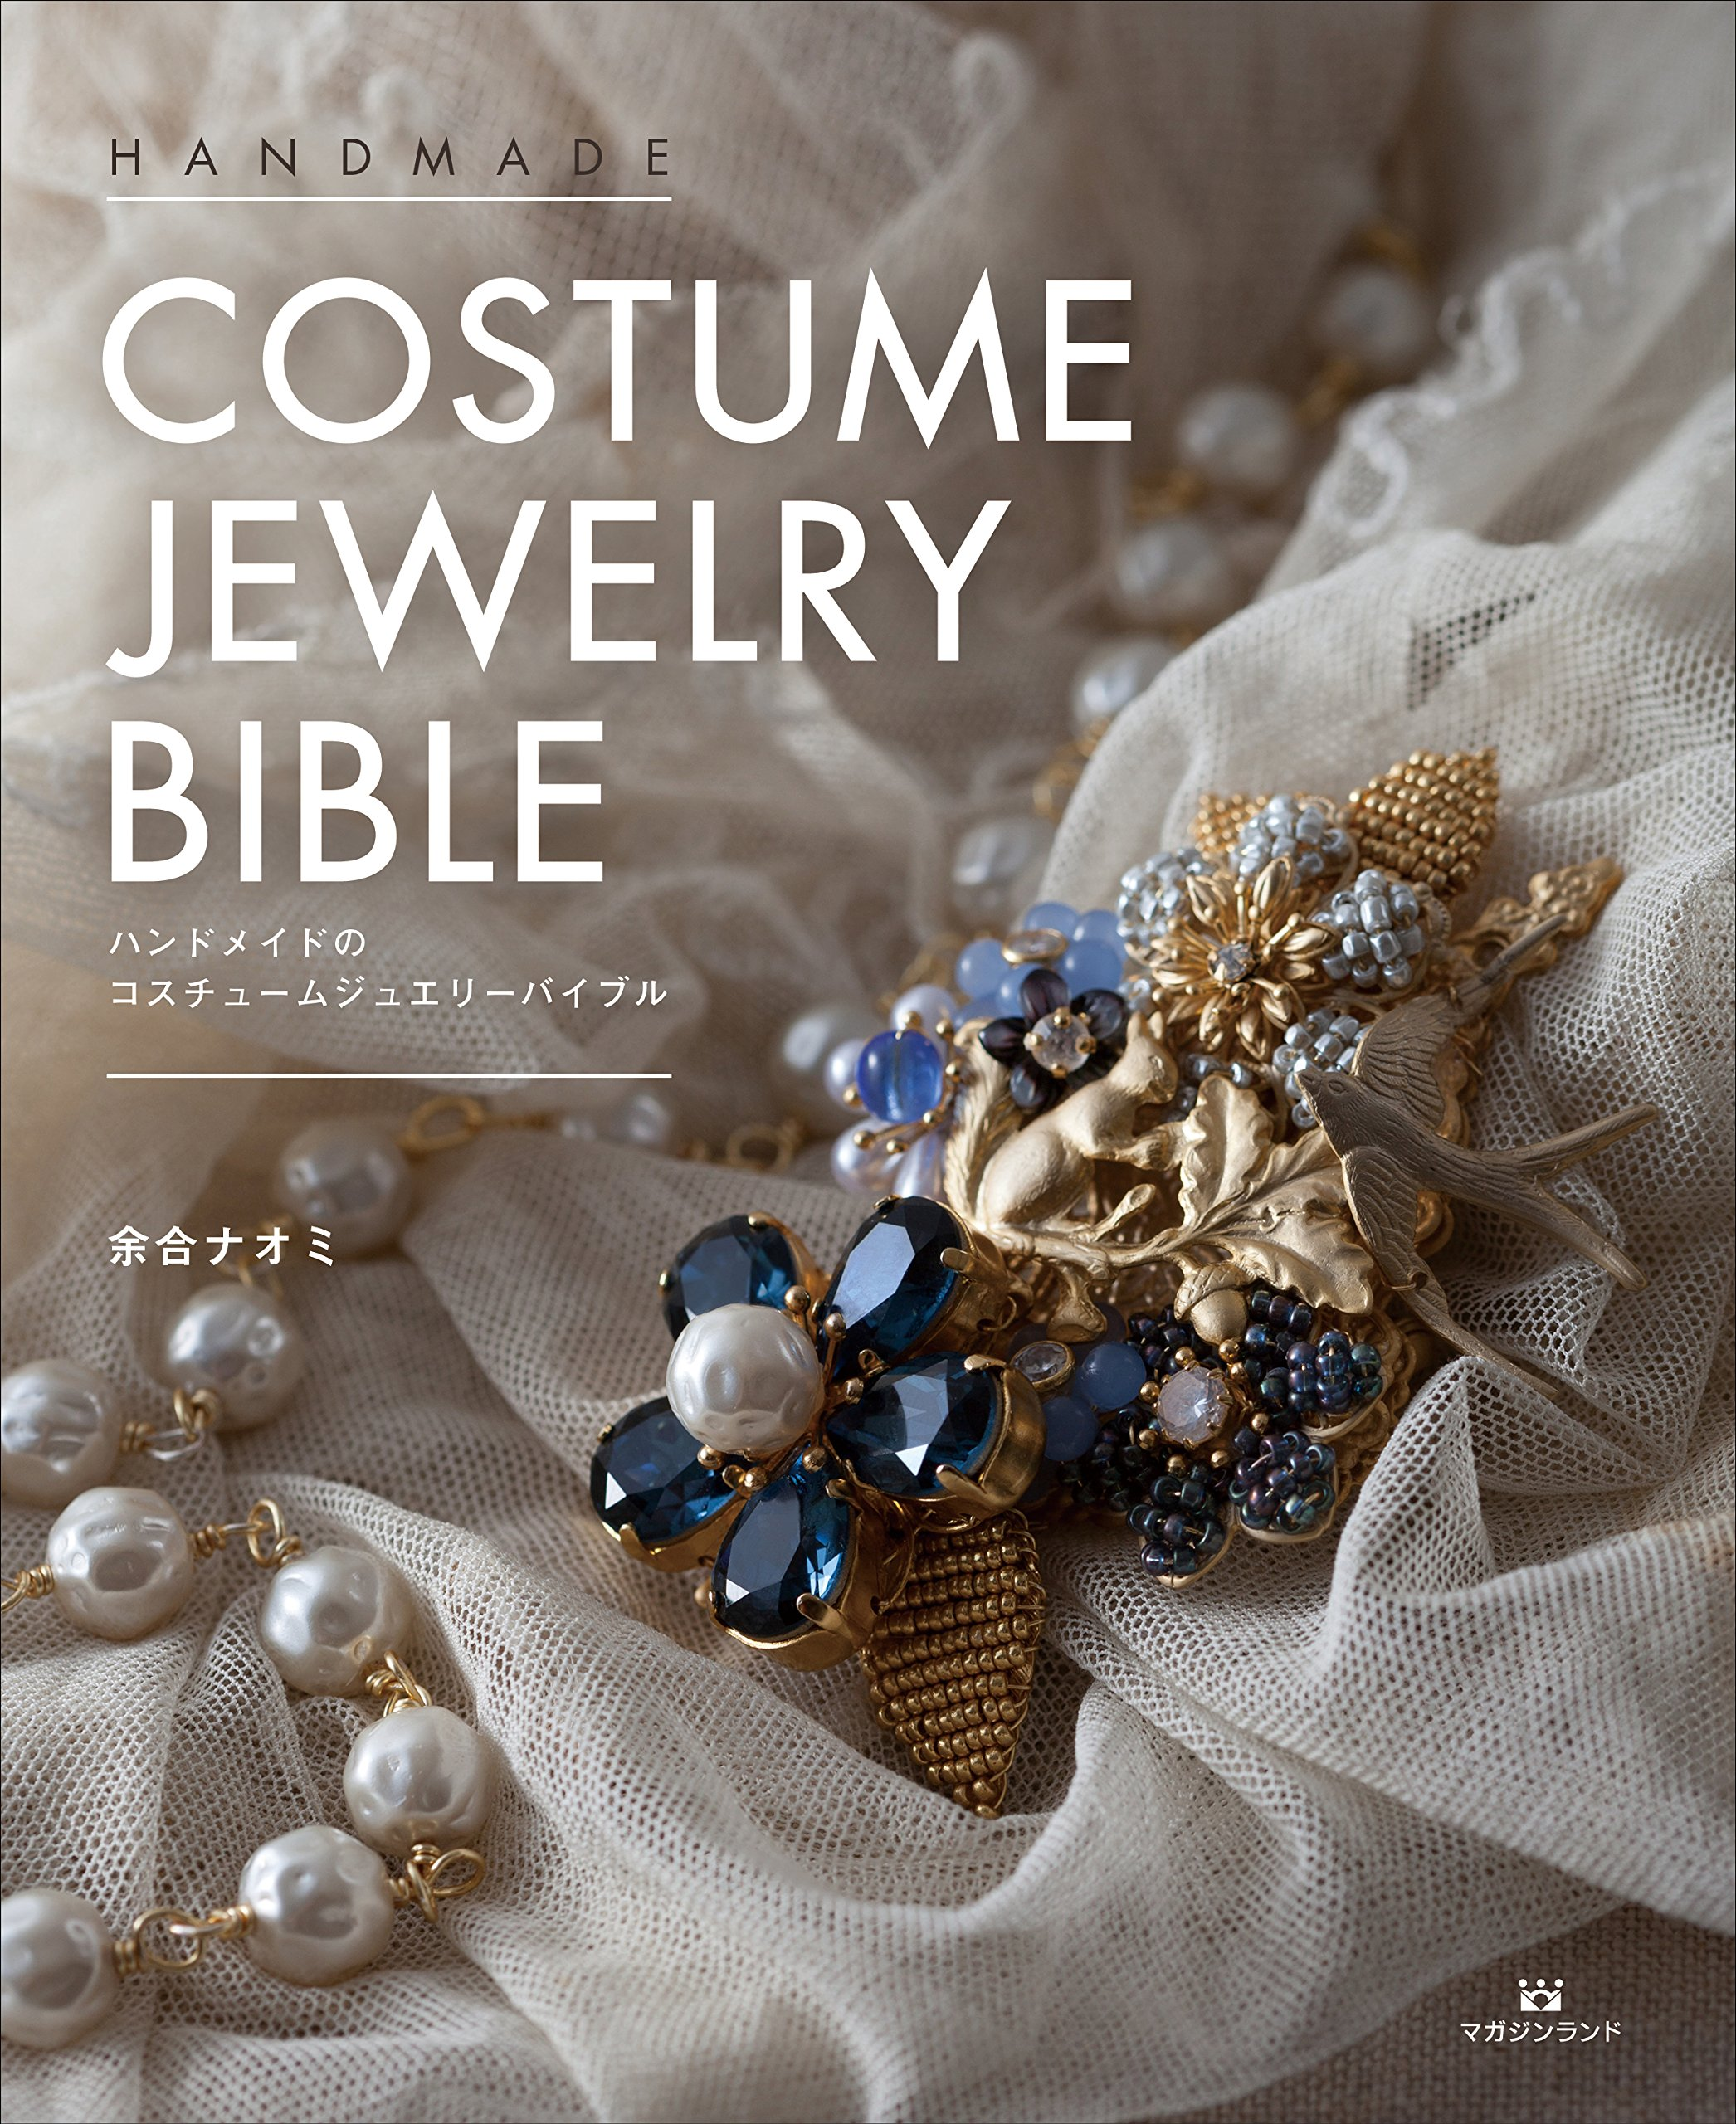 Handmade costume jewelry Bible